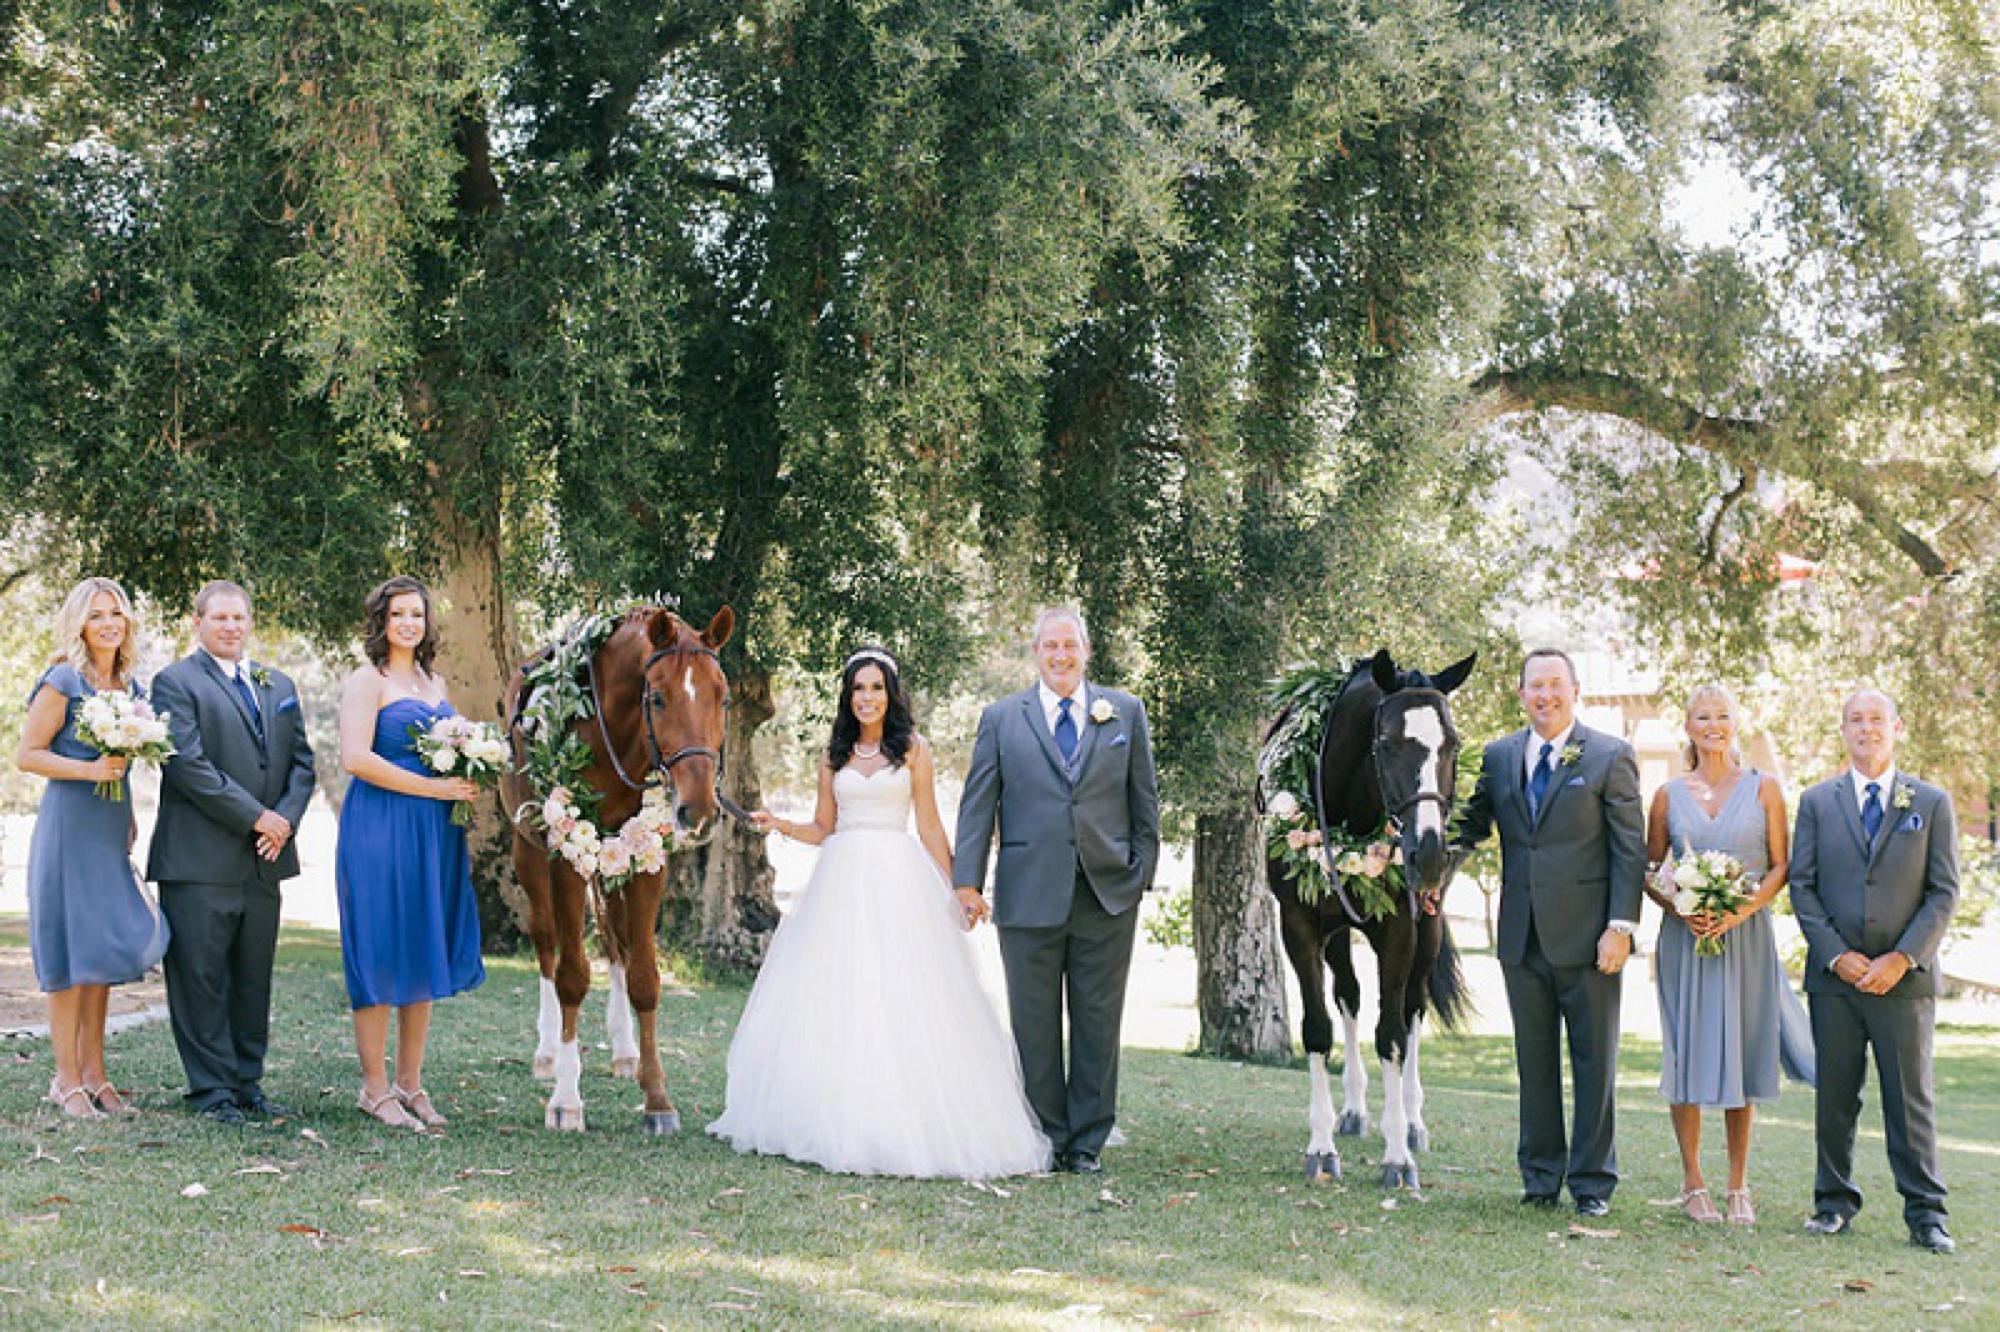 LVL Weddings and Events Giracci Vineyards